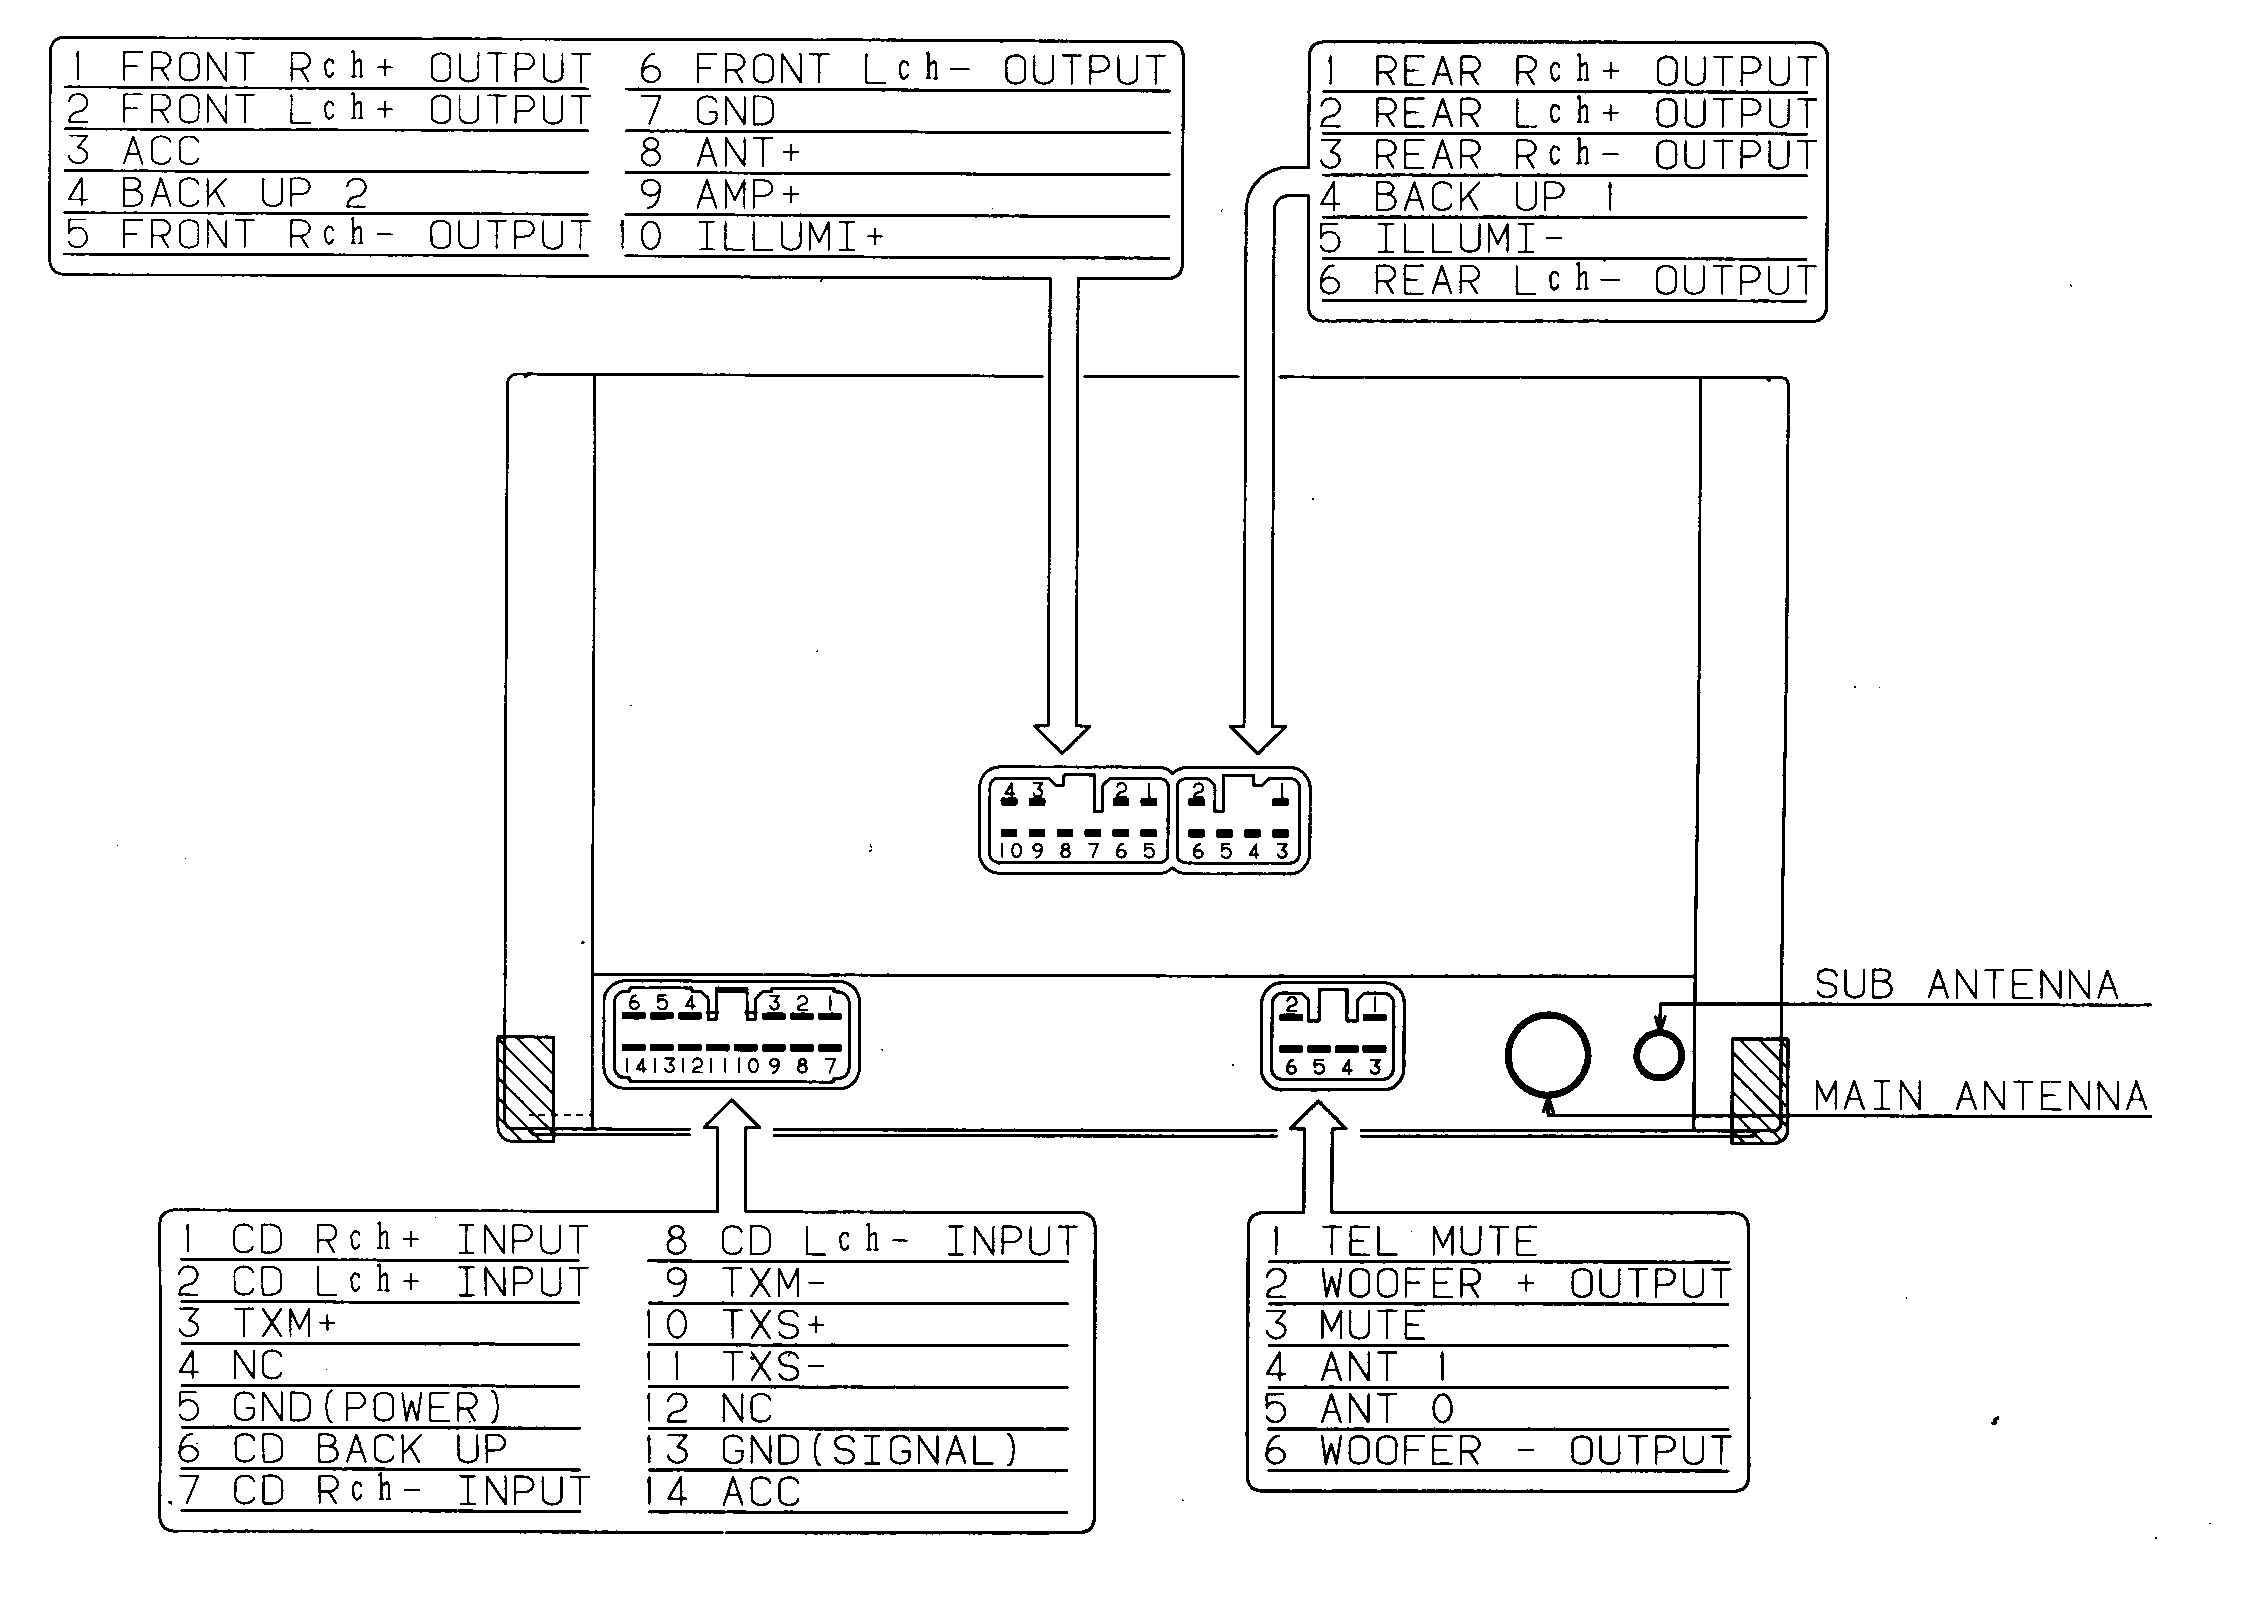 2007 Gmc Canyon Stereo Wiring Diagram: Gmc Canyon Radio Wiring Diagram  Chevy Express Radio Wiring